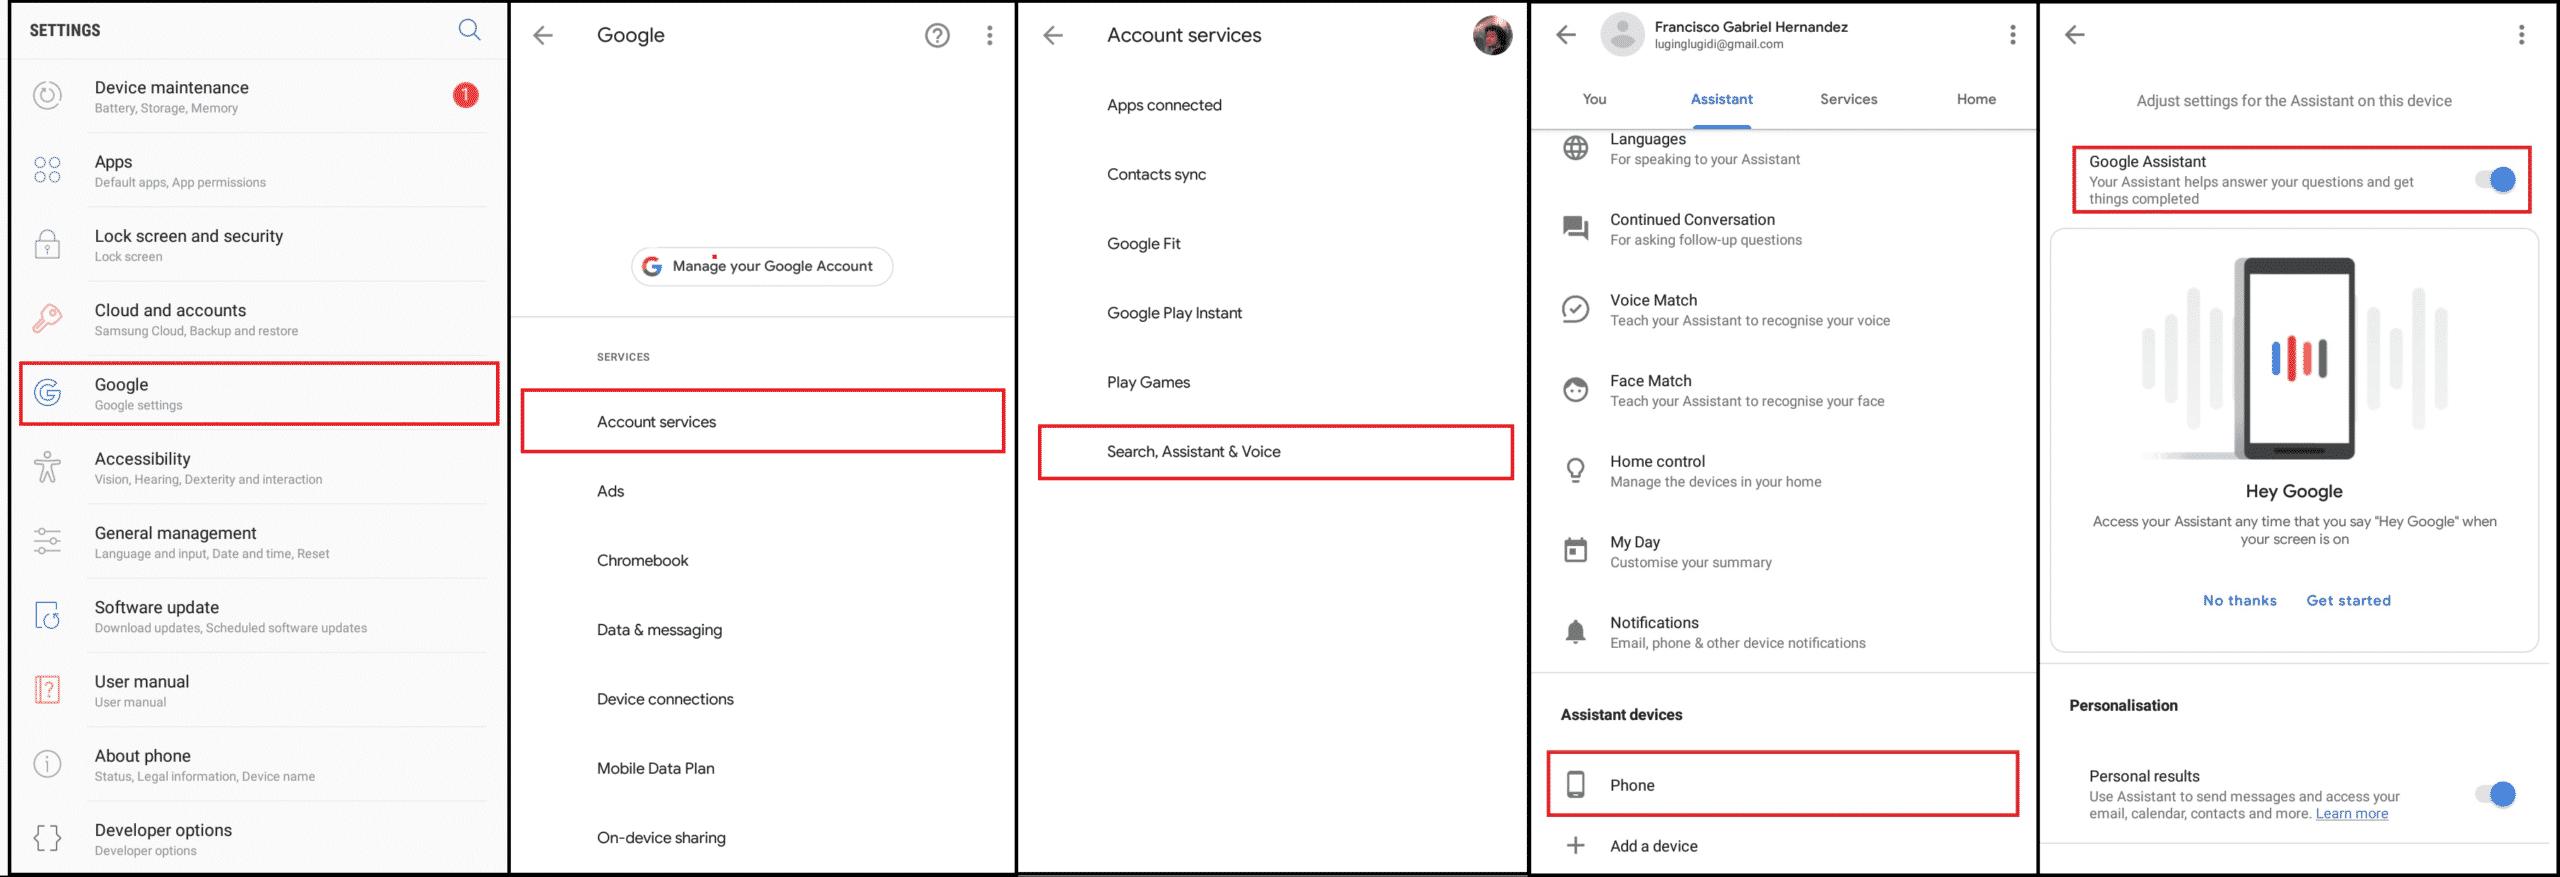 Podľa týchto pokynov deaktivujte svoje Google Assistant